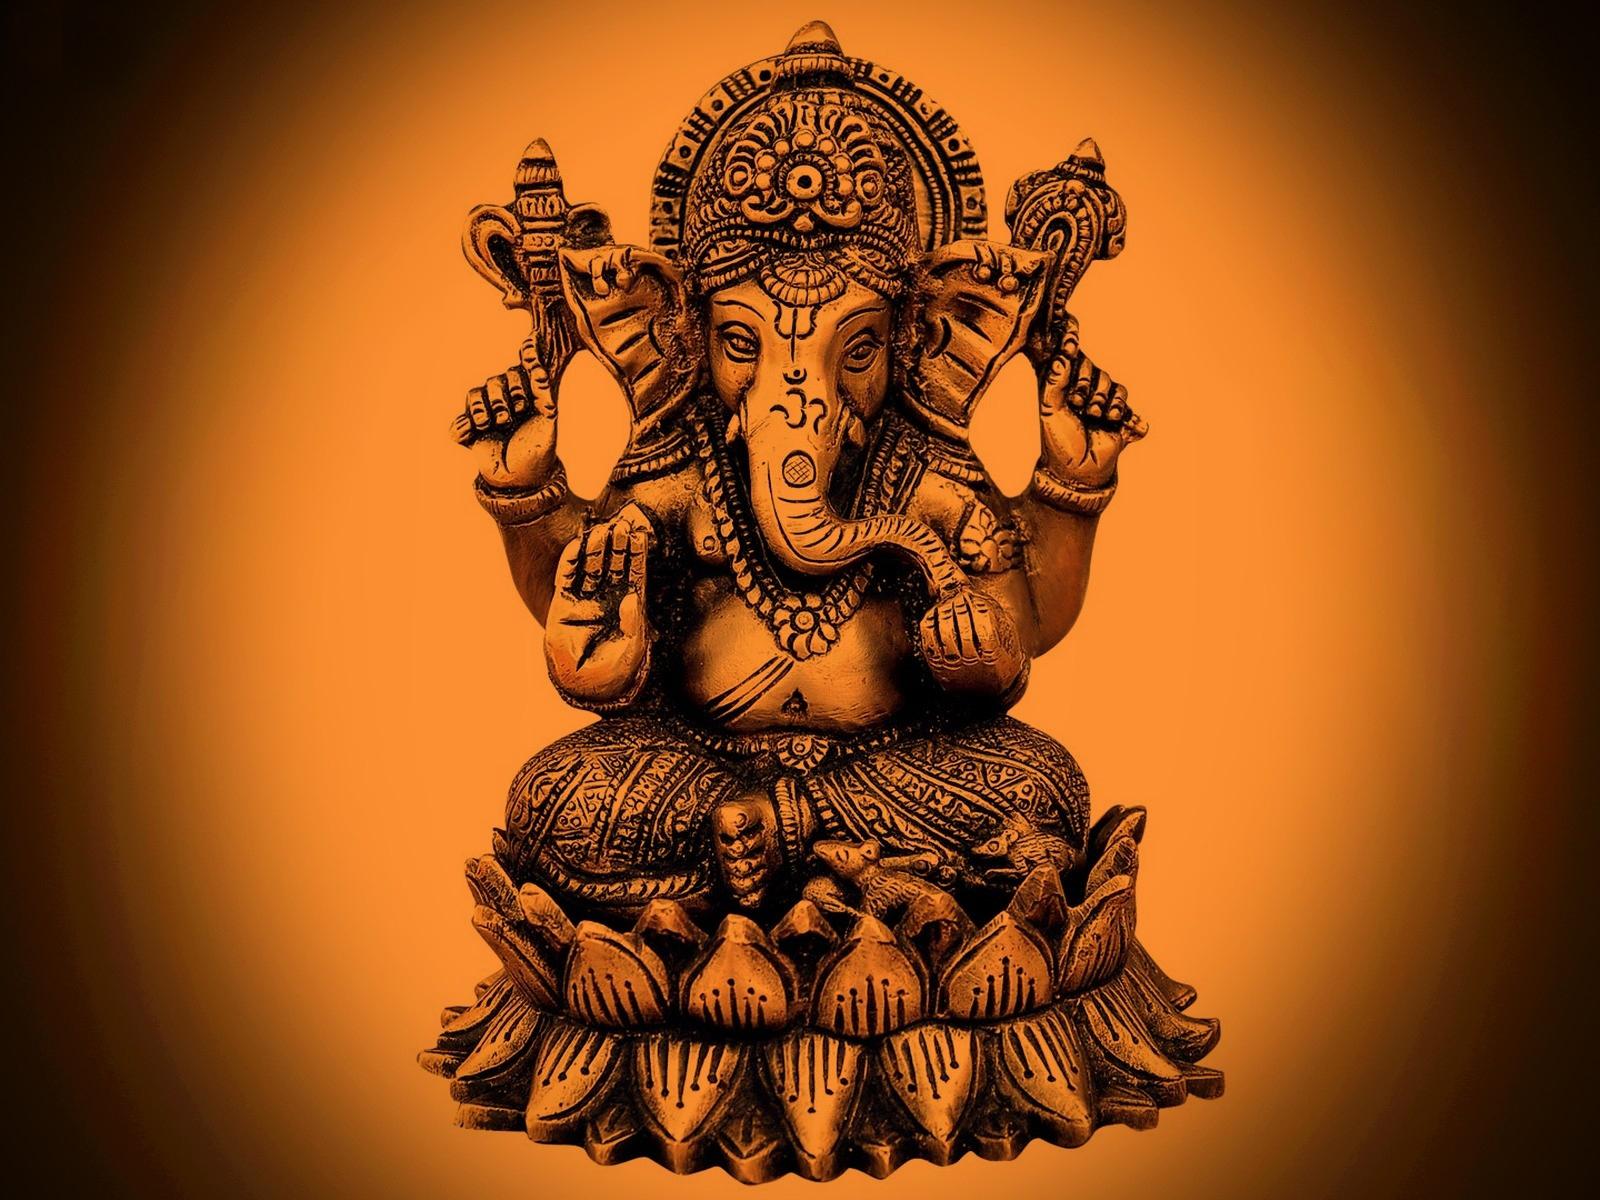 Ganesha Bhagwan HD Wallpaper Free Download 1080p